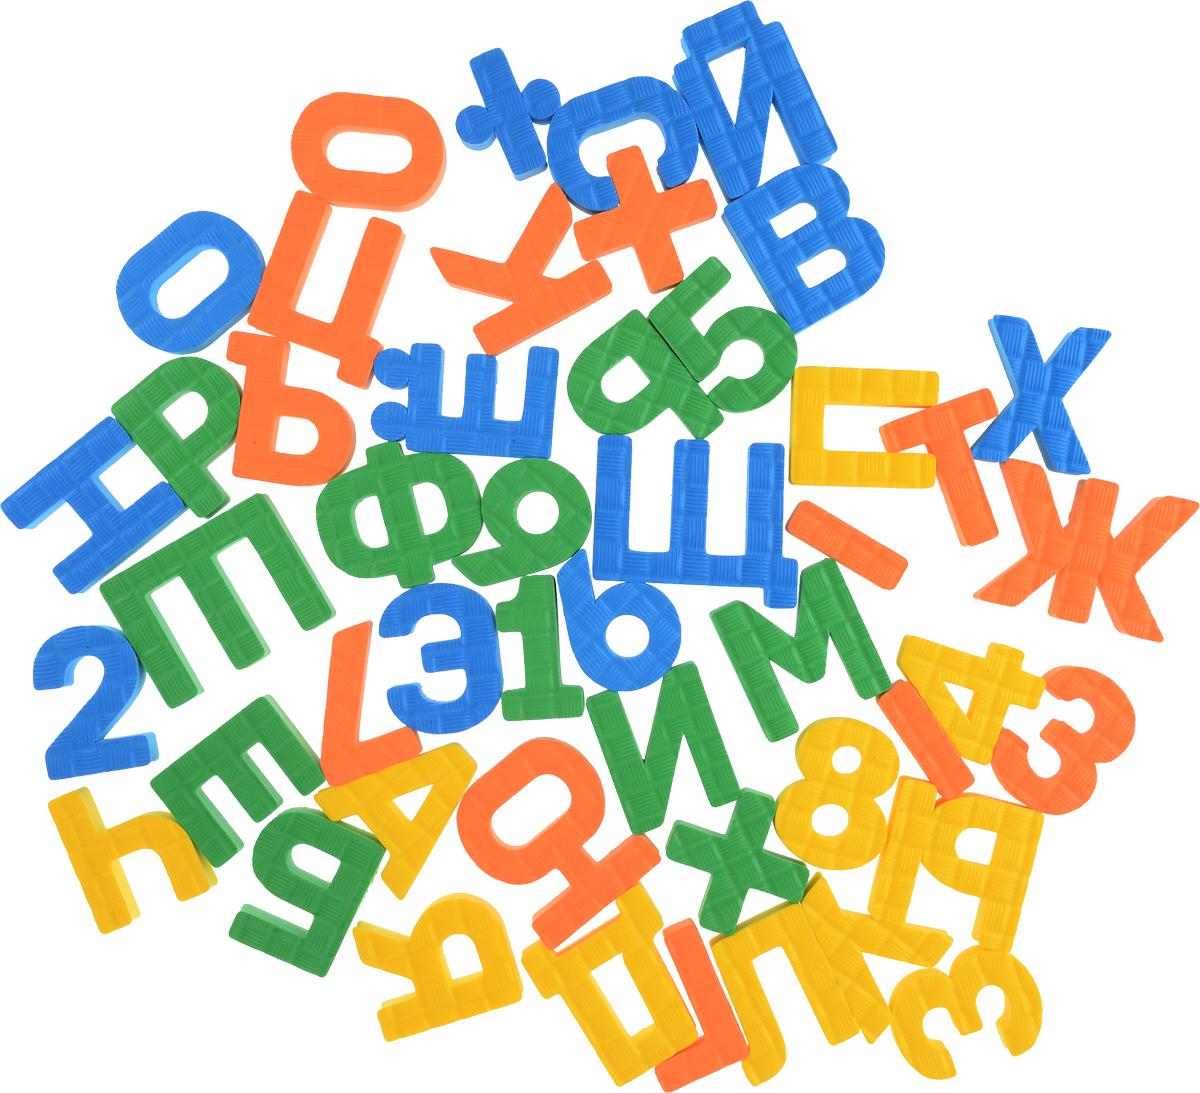 Pic'nMix Набор игрушек для ванной Буквы-цифры цвет желтый оранжевый зеленый буквы и цифры мастер игрушек магнитные цифры цифры ig0080